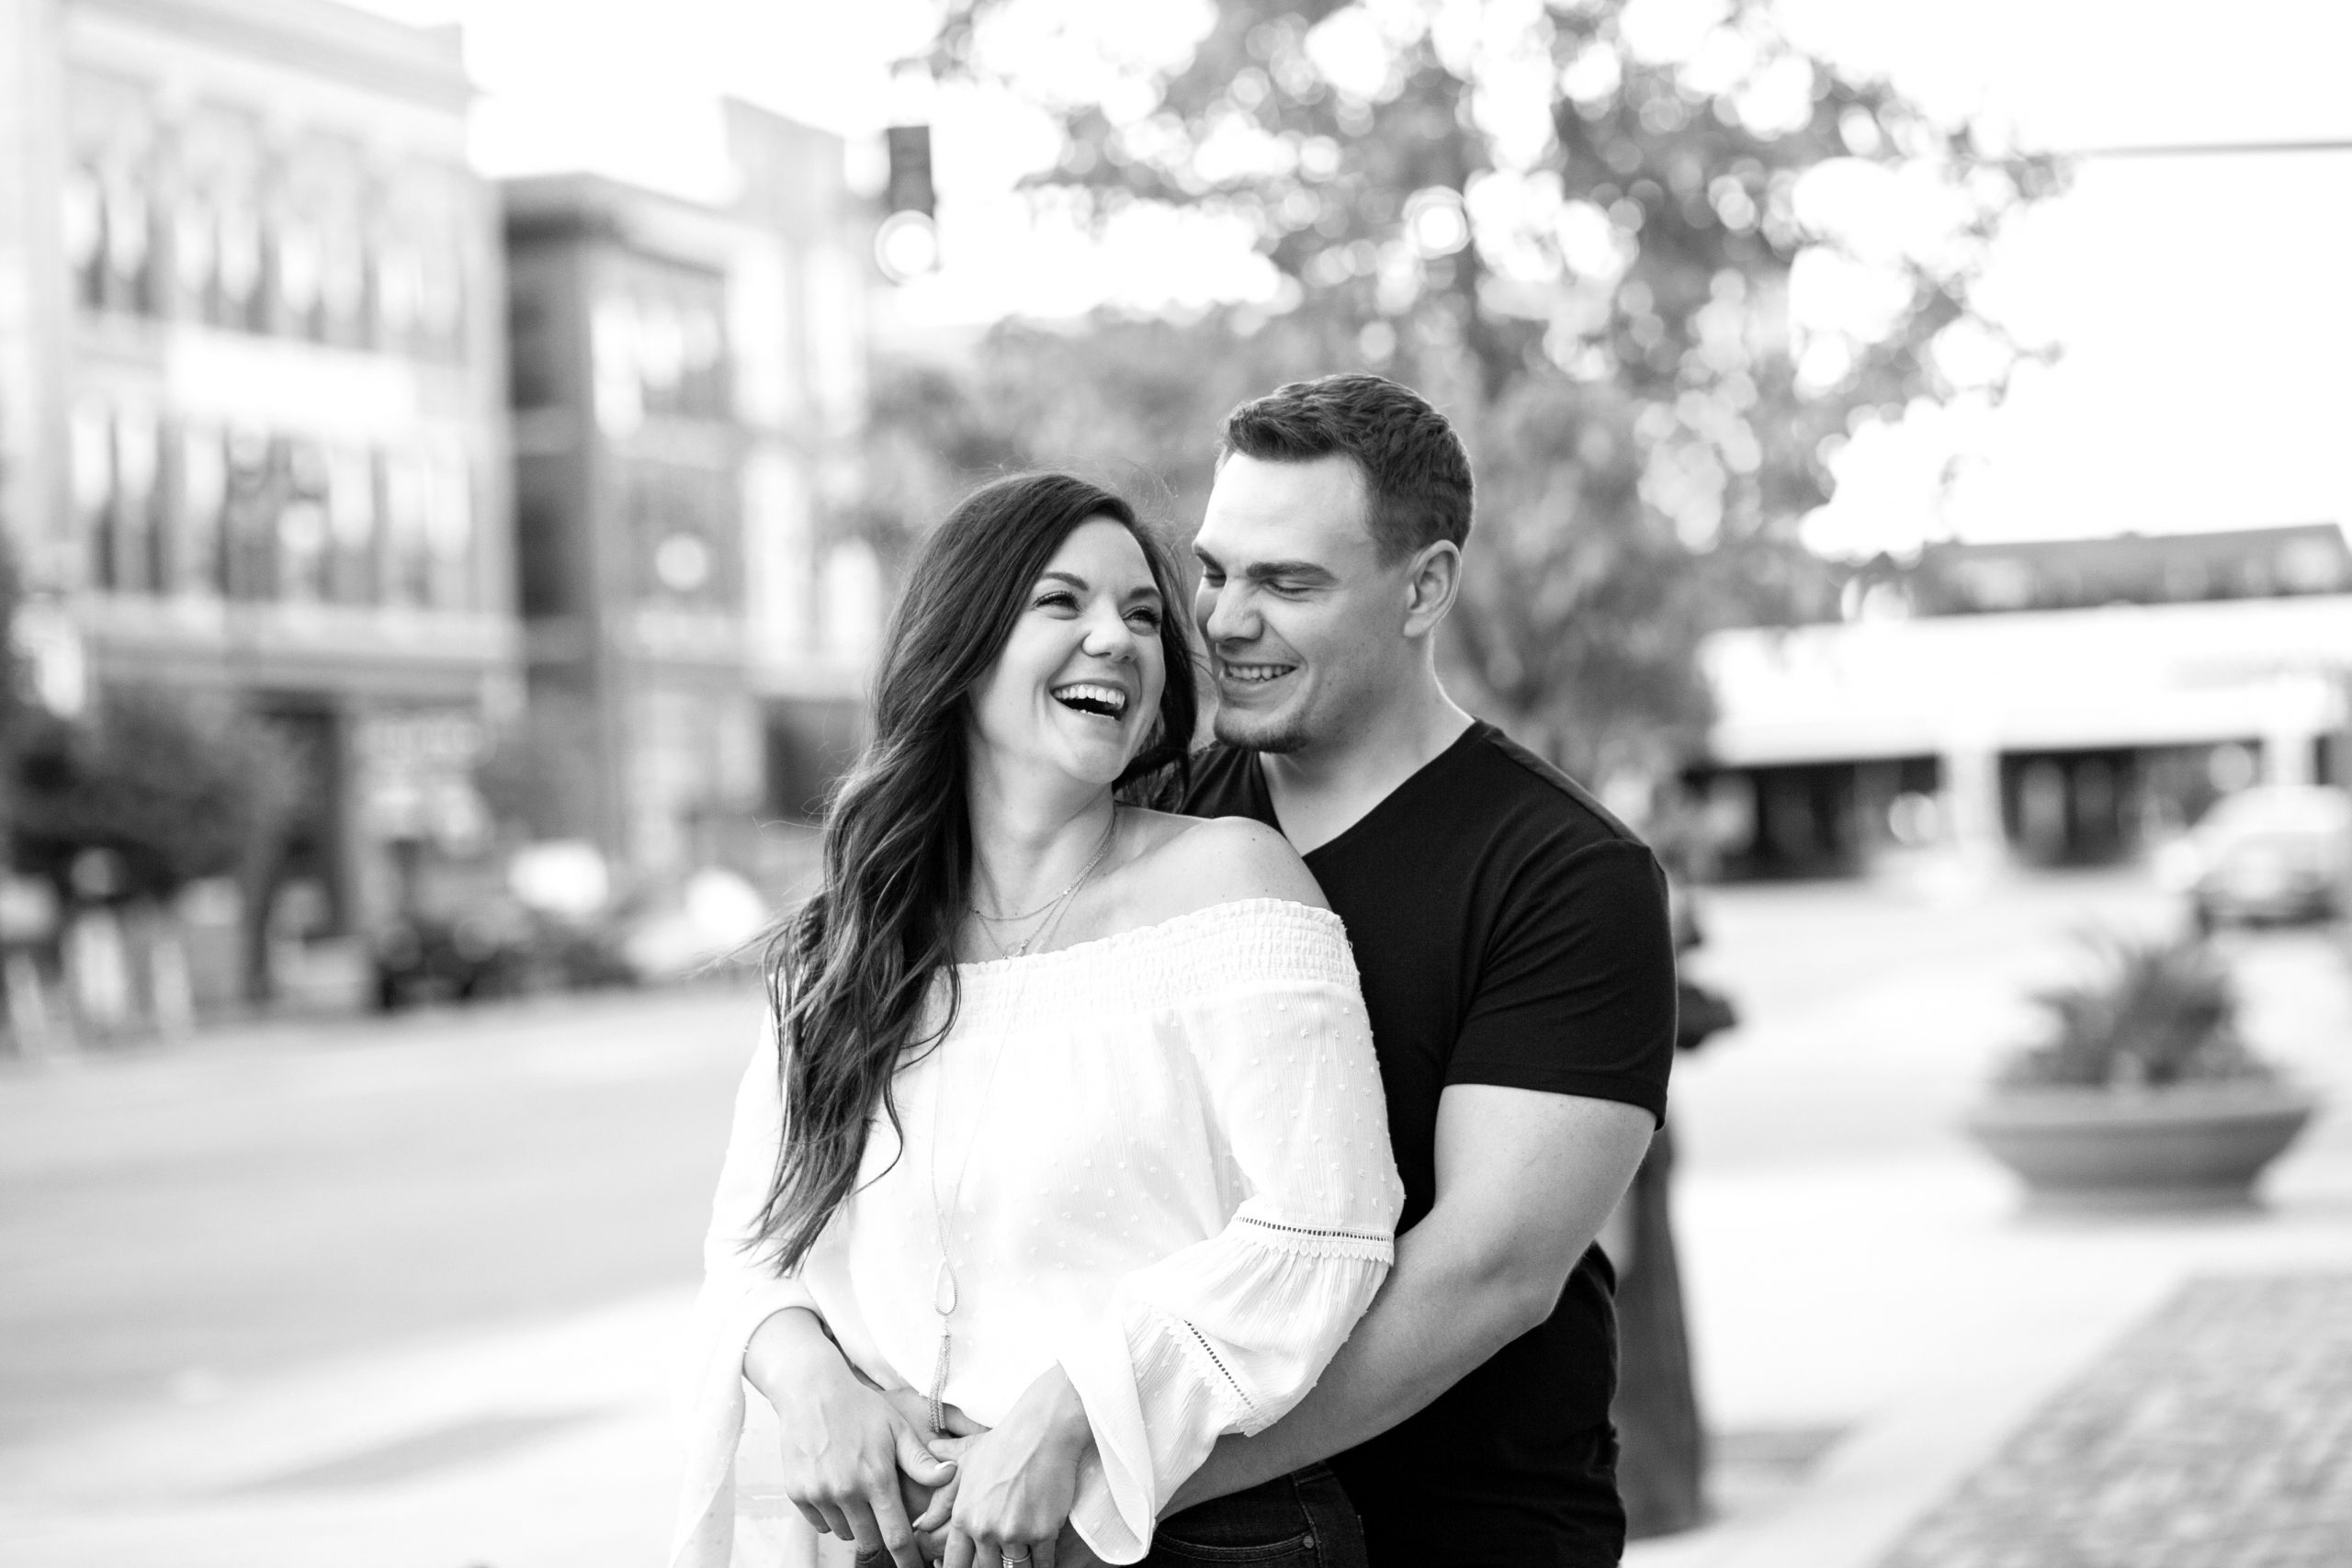 Trevor-Haley-Wichita-Engagement-Session-257 BW